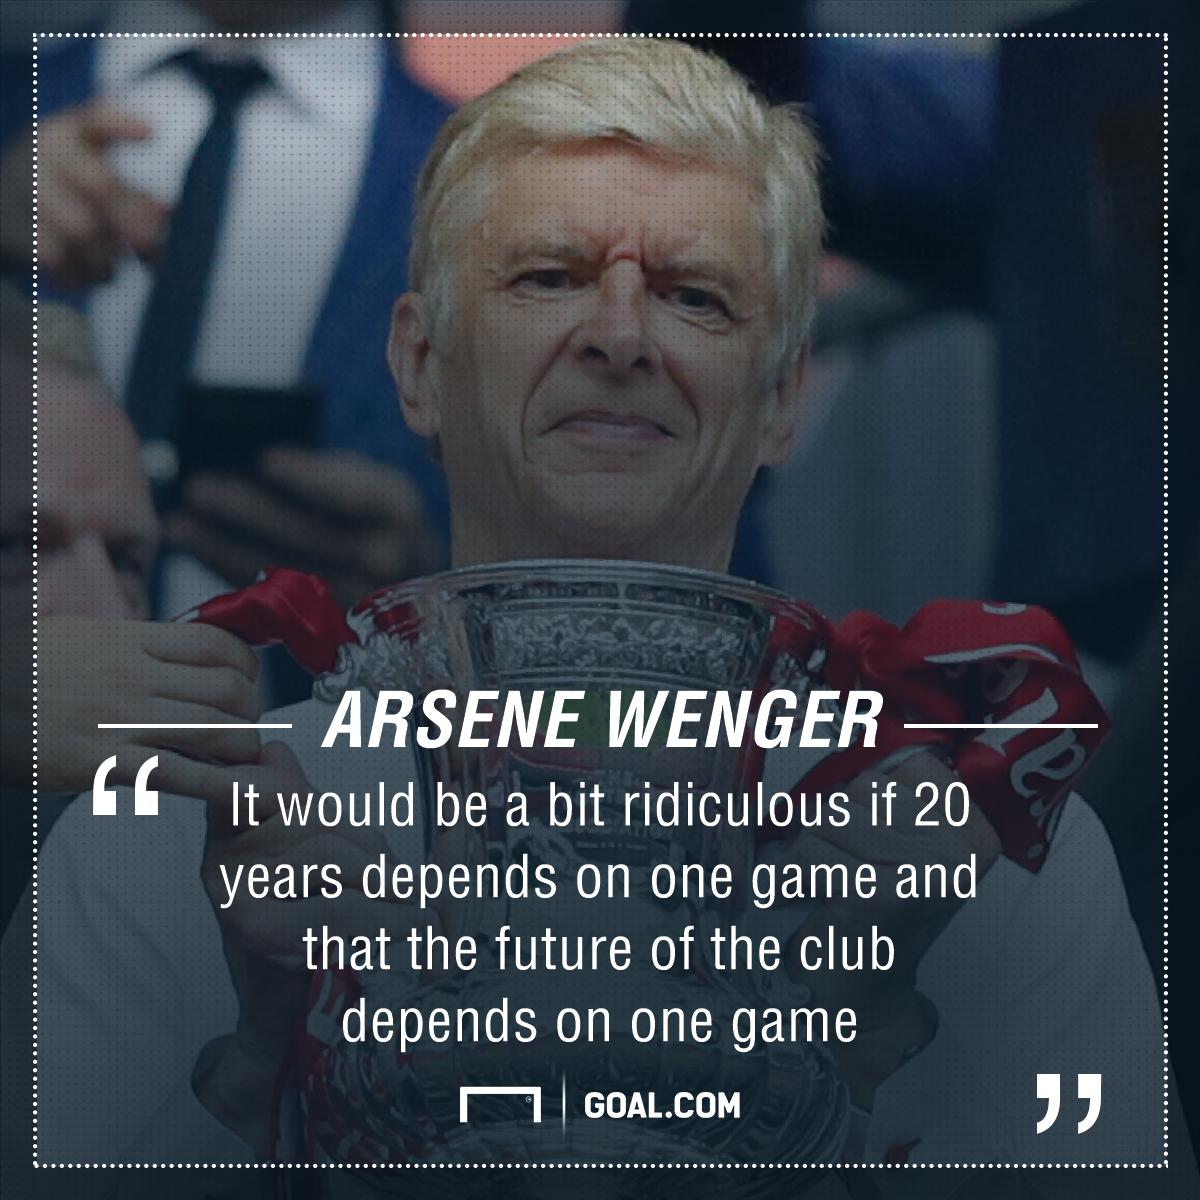 GFX Info Arsene Wenger Arsenal FA Cup